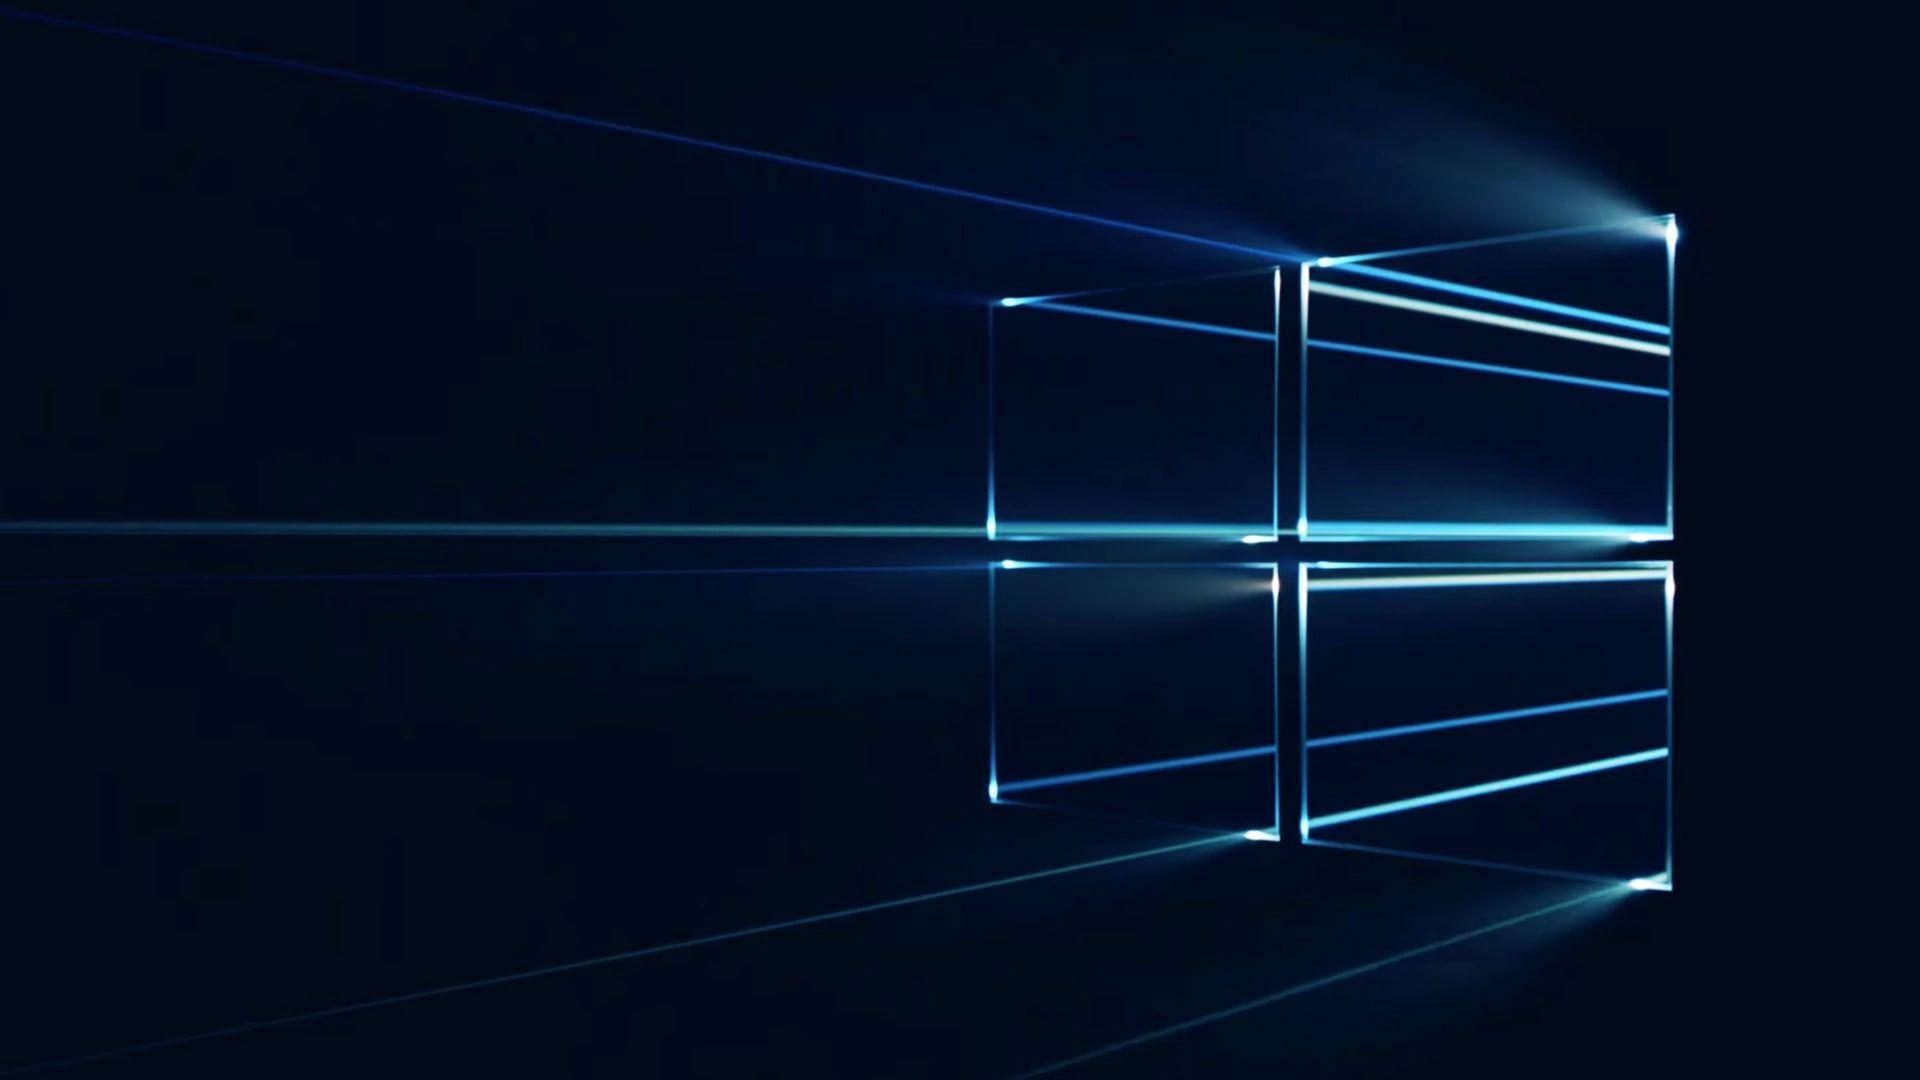 Microsoft Windows 10 Desktop Wallpaper 04 1080p Wallpaper Hdwallpaper Desktop Windows 10 Microsoft Windows Windows Wallpaper